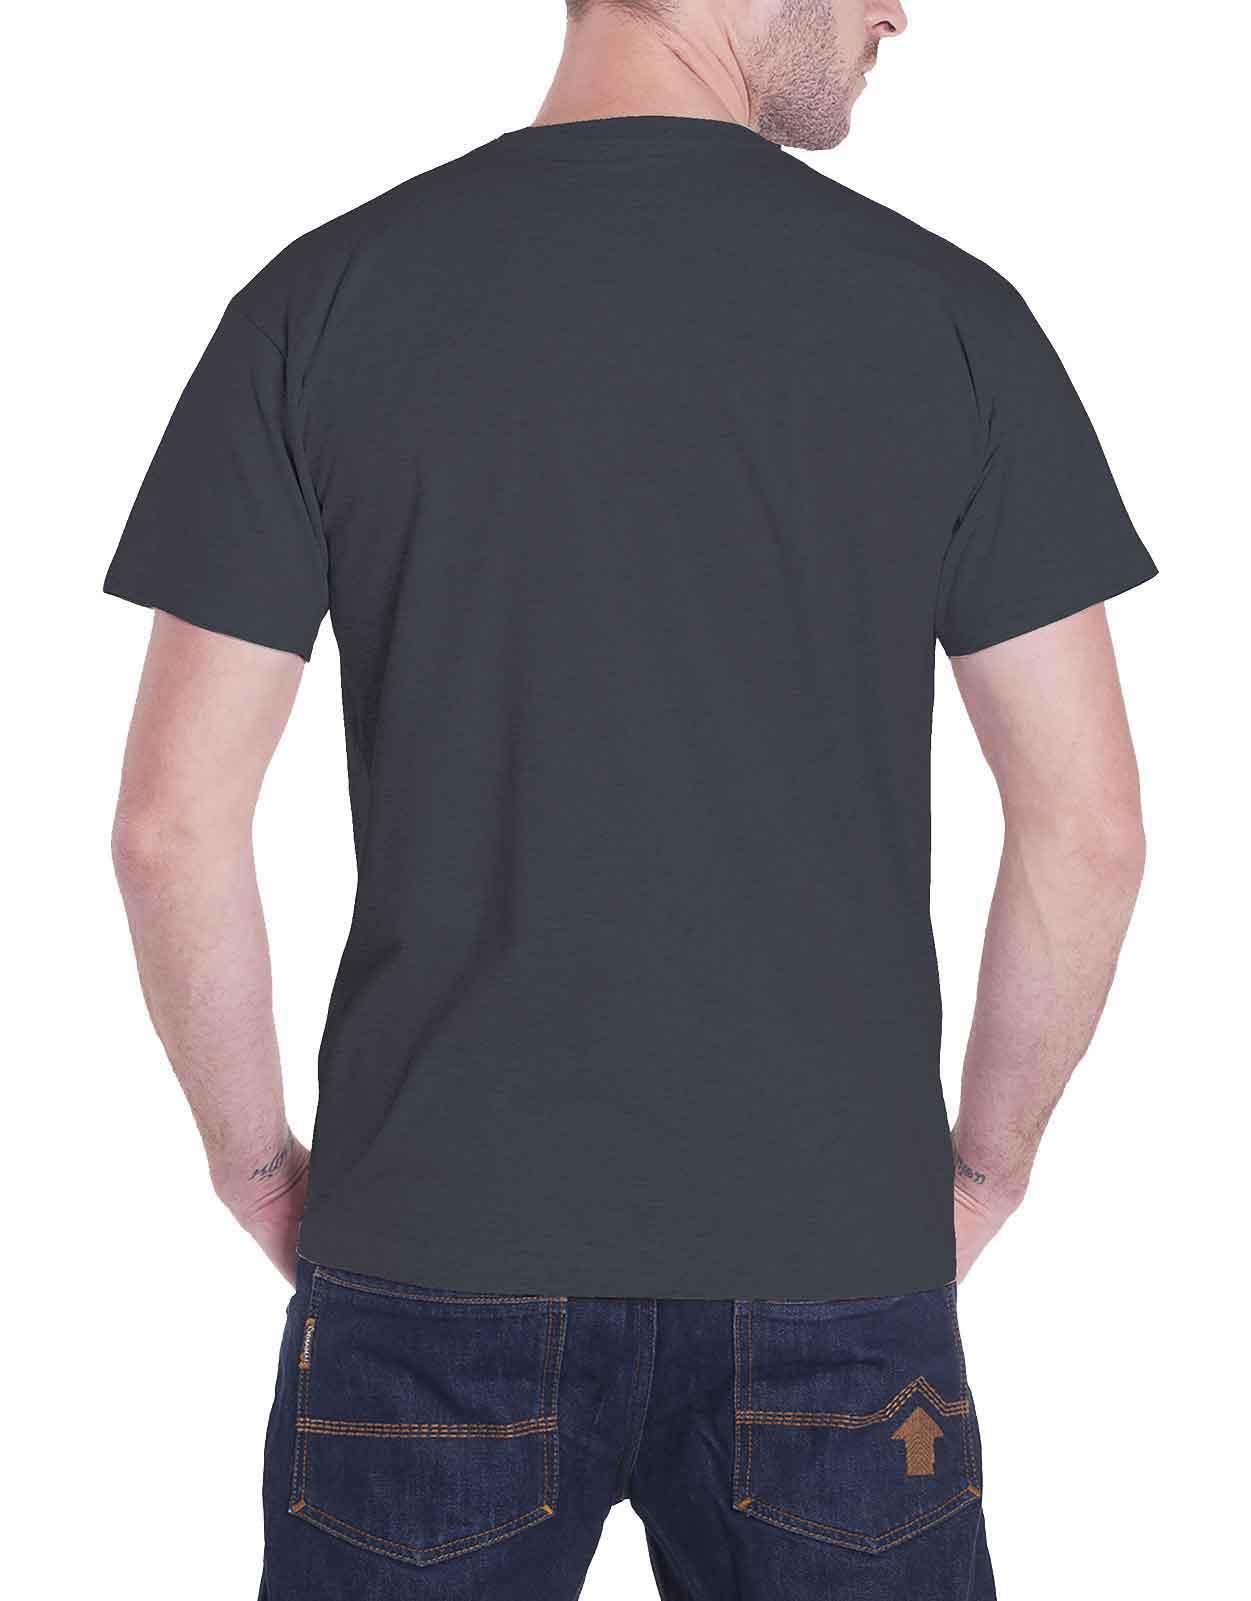 Officiel-Harry-Potter-T-Shirt-Poudlard-Gryffondor-Poufsouffle-cretes-Homme-NEUF miniature 7